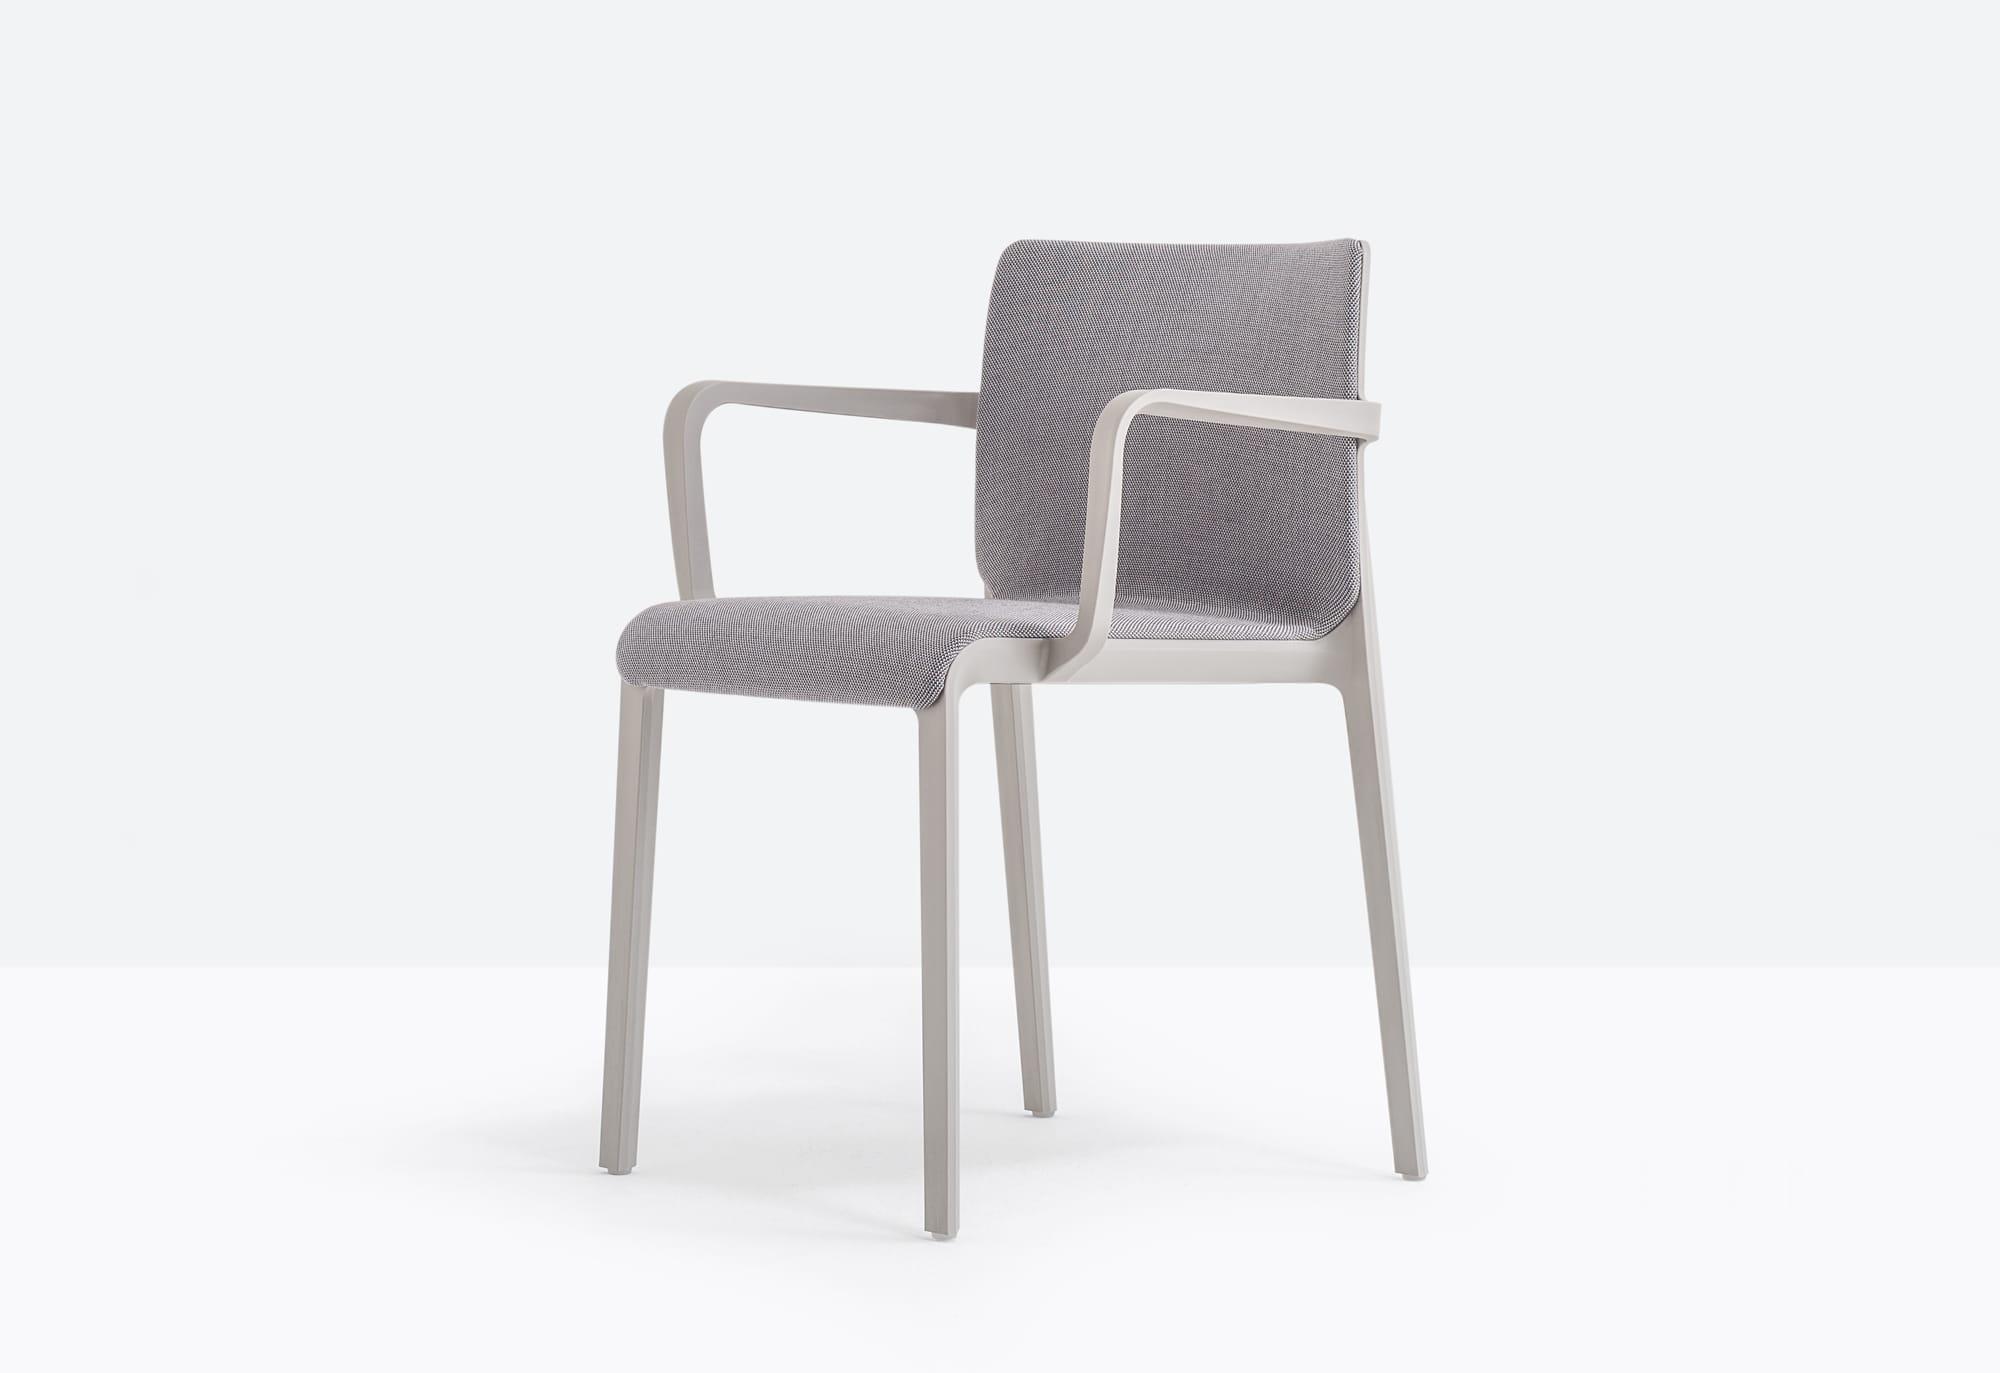 Pedrali Krzesło Volt 676 Niebieski